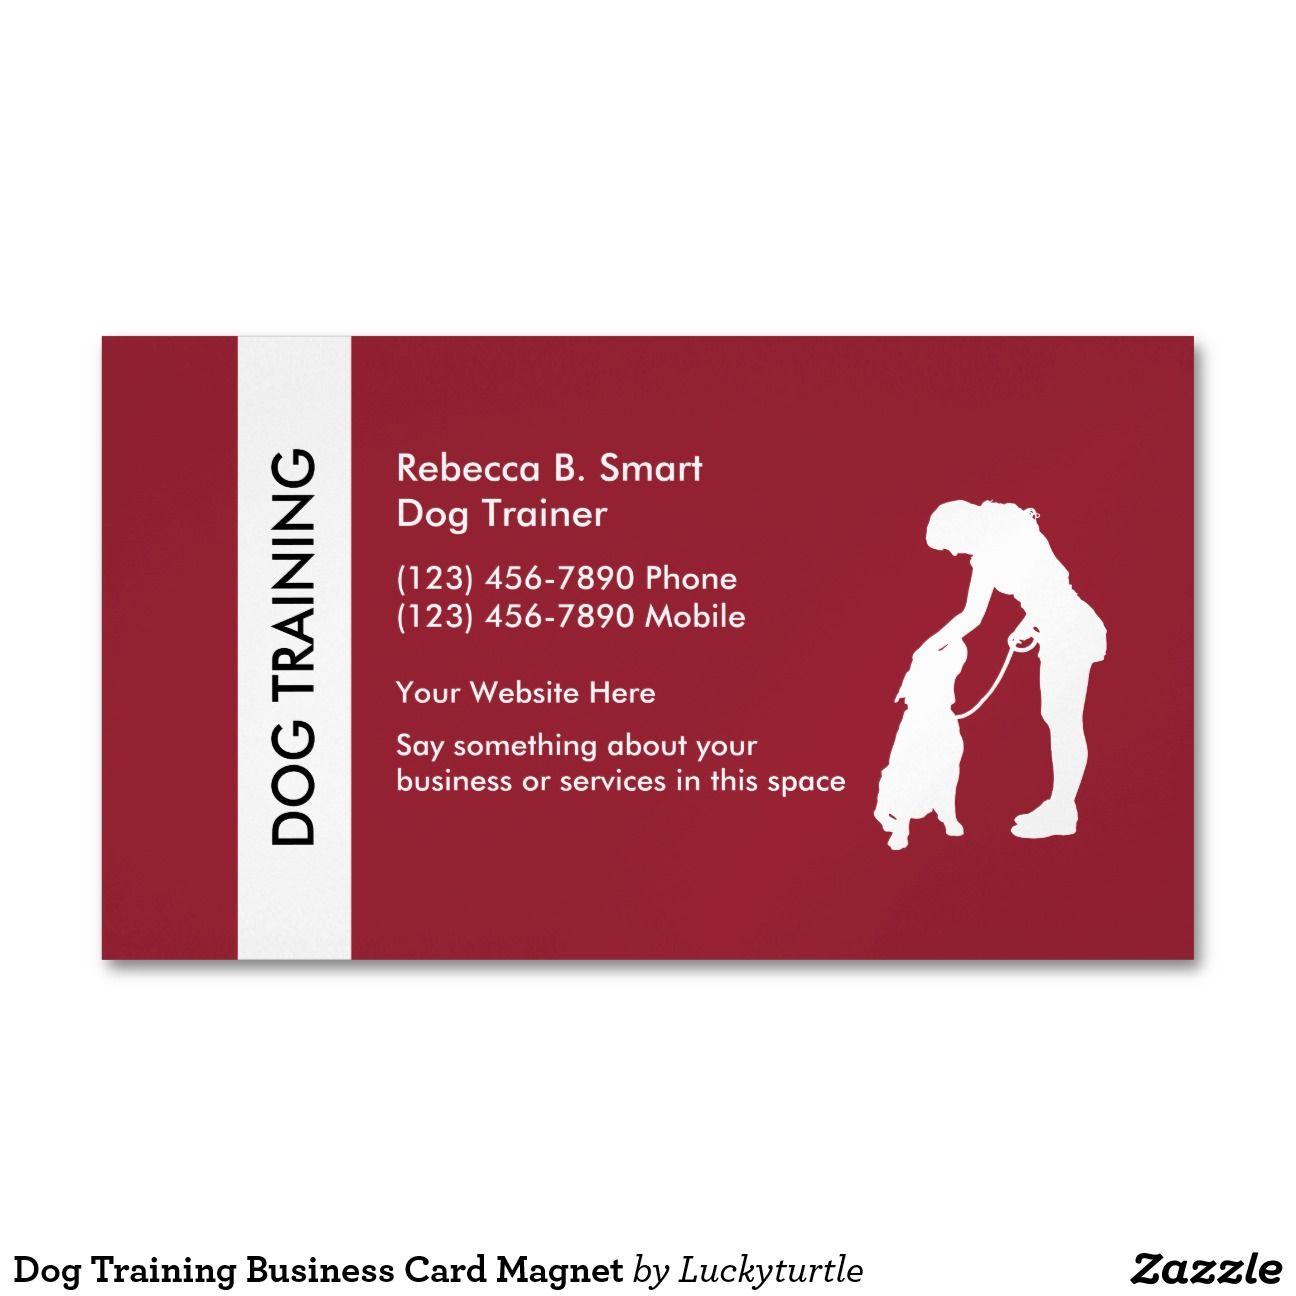 Dog Training Business Card Magnet Magnetic Business Cards | Branding ...